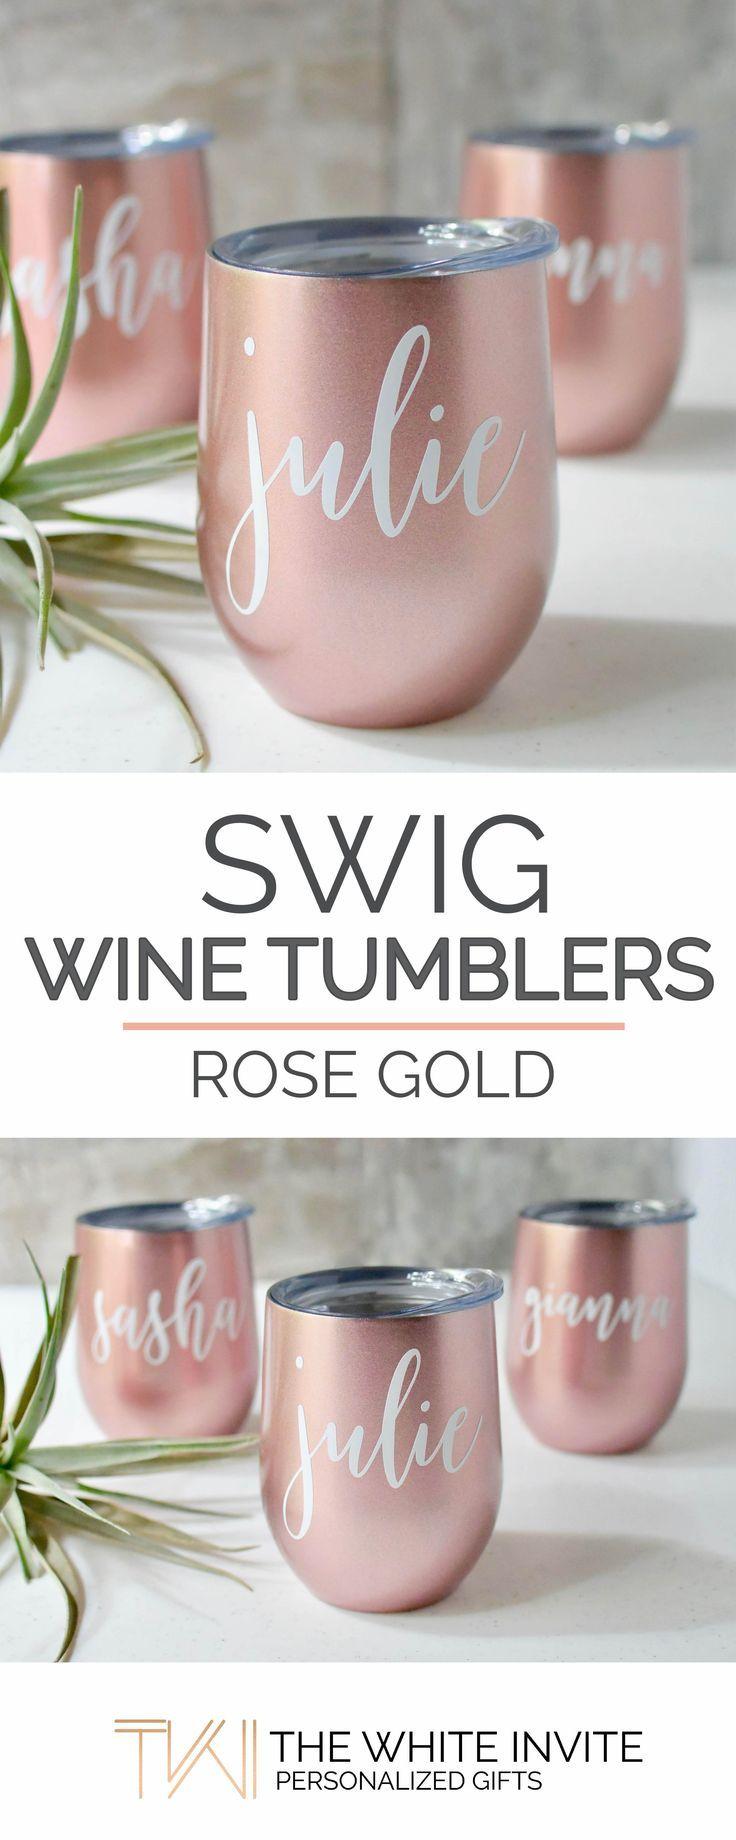 Rose Gold Swig Wine Tumbler Bridesmaid Gift - Bachelorette Gift ...